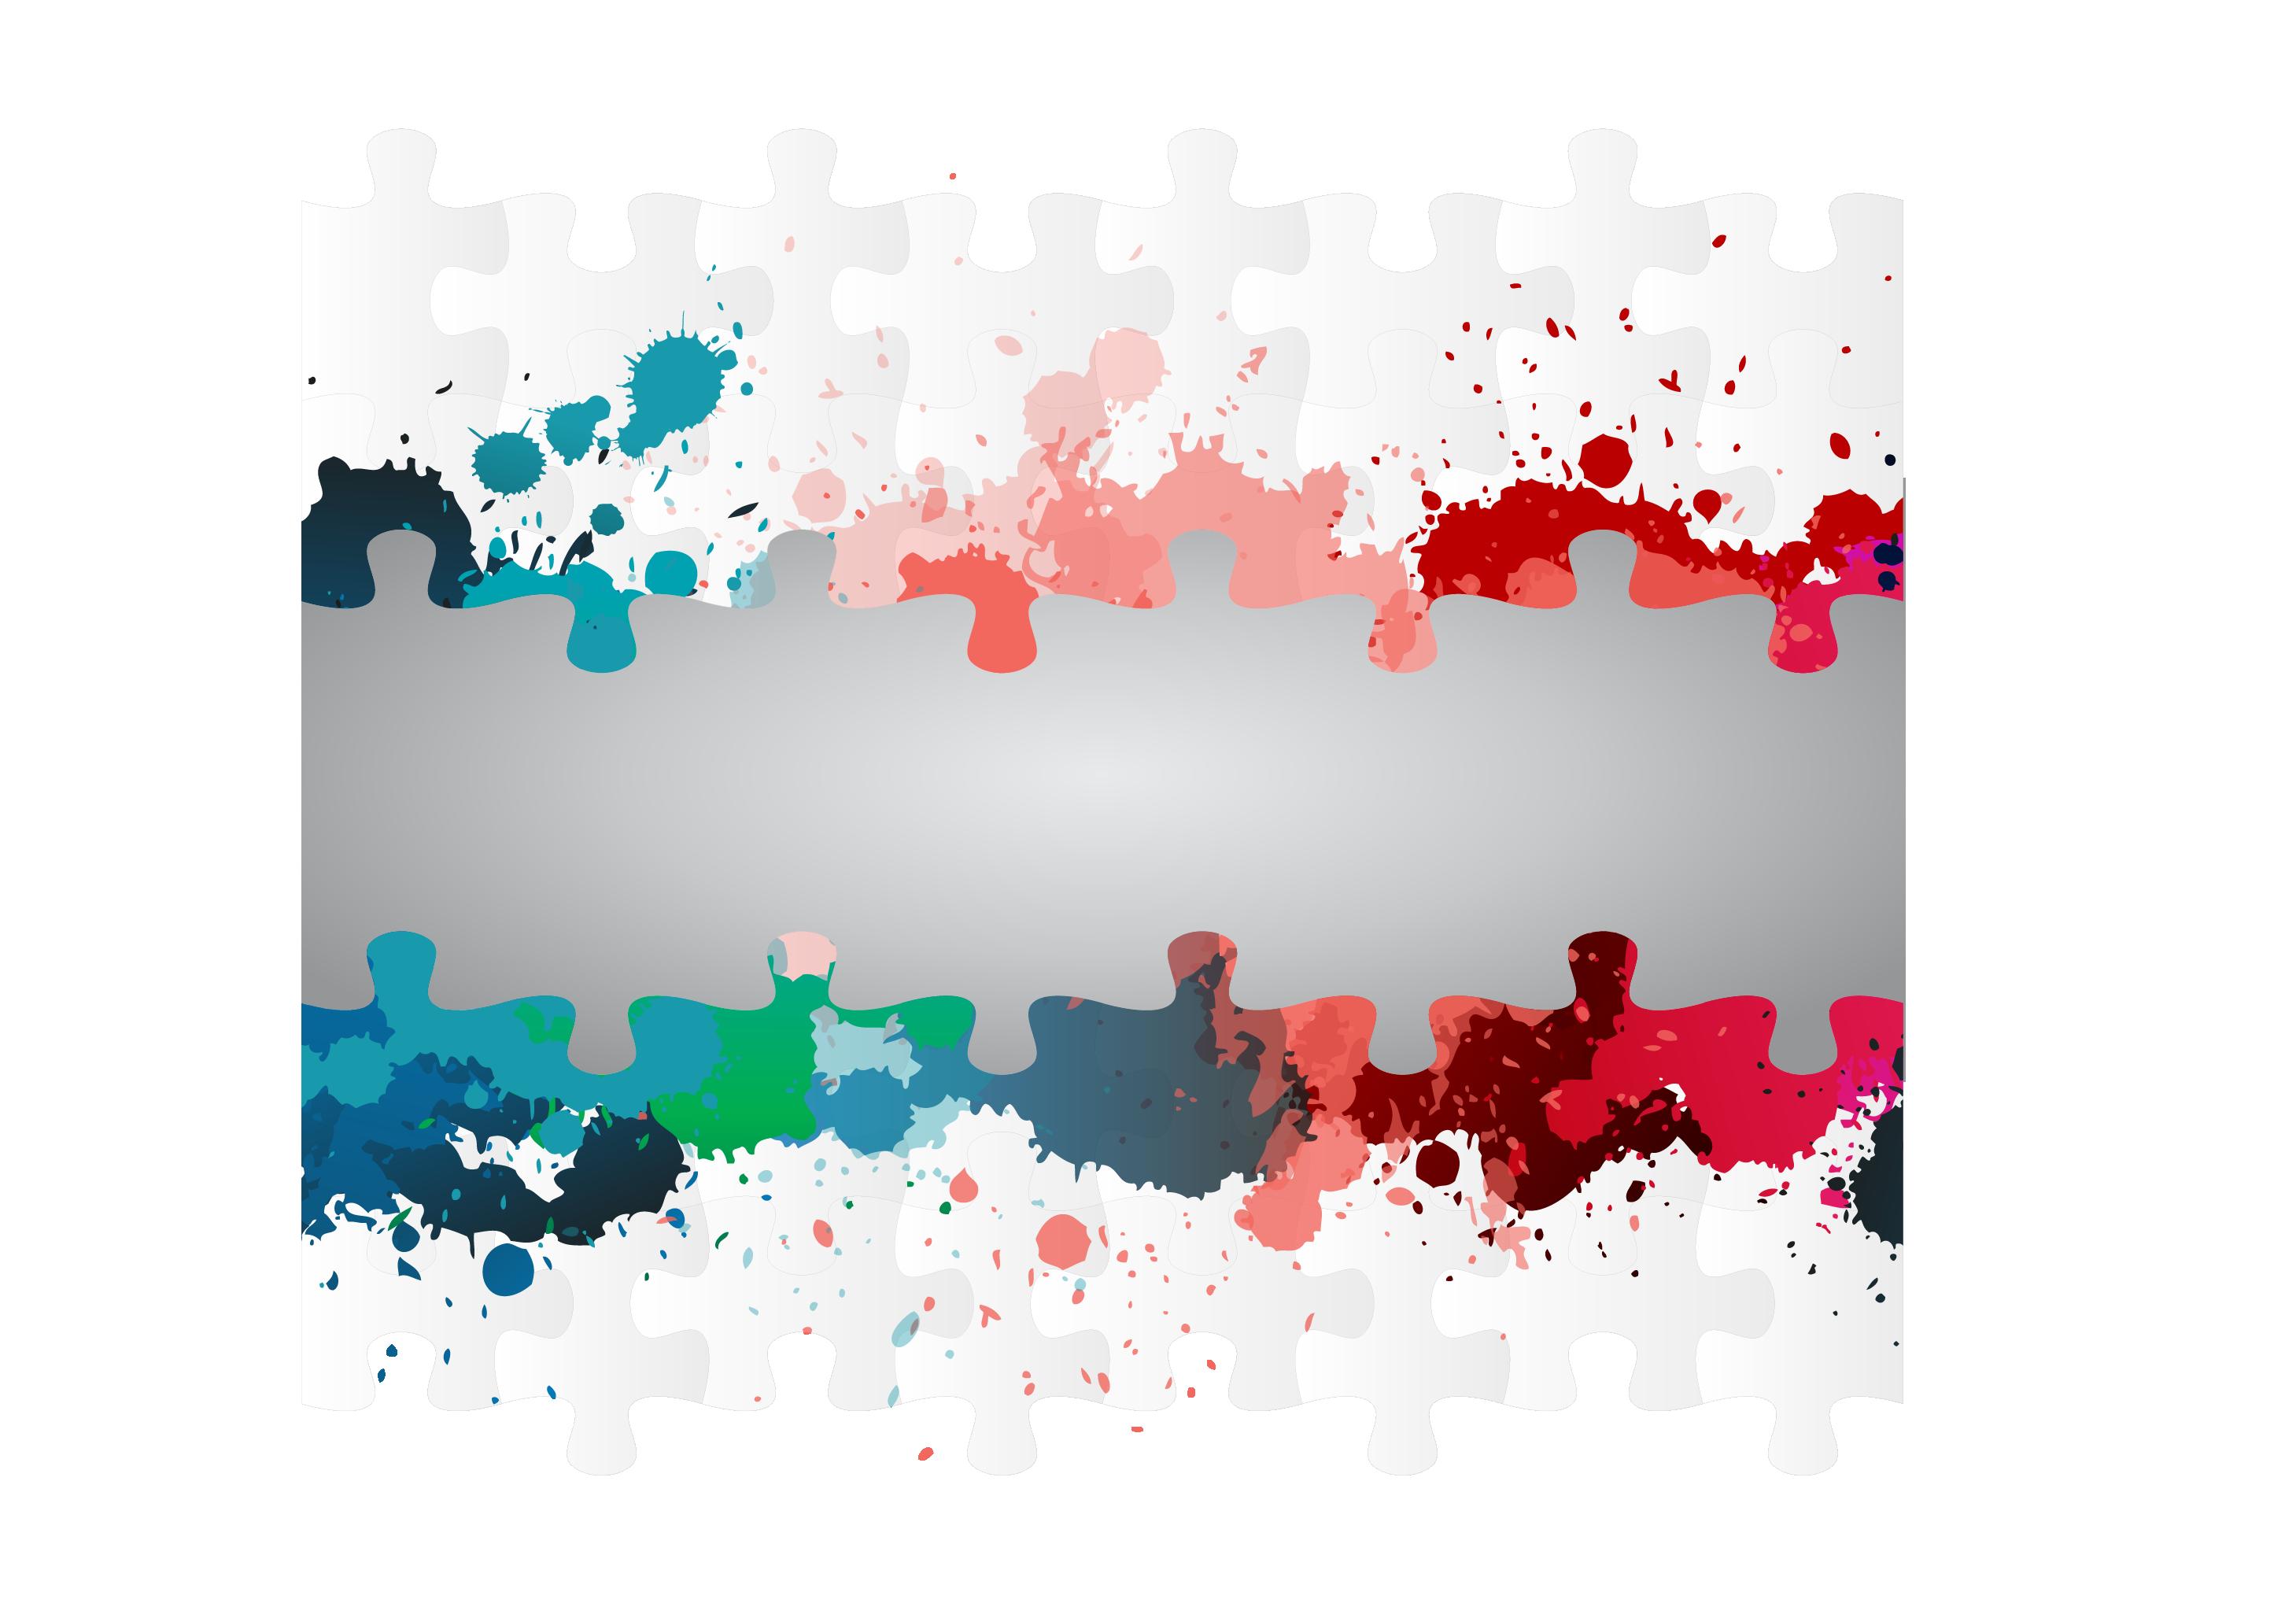 Teamwork clipart puzzle. Jigsaw png transparent free